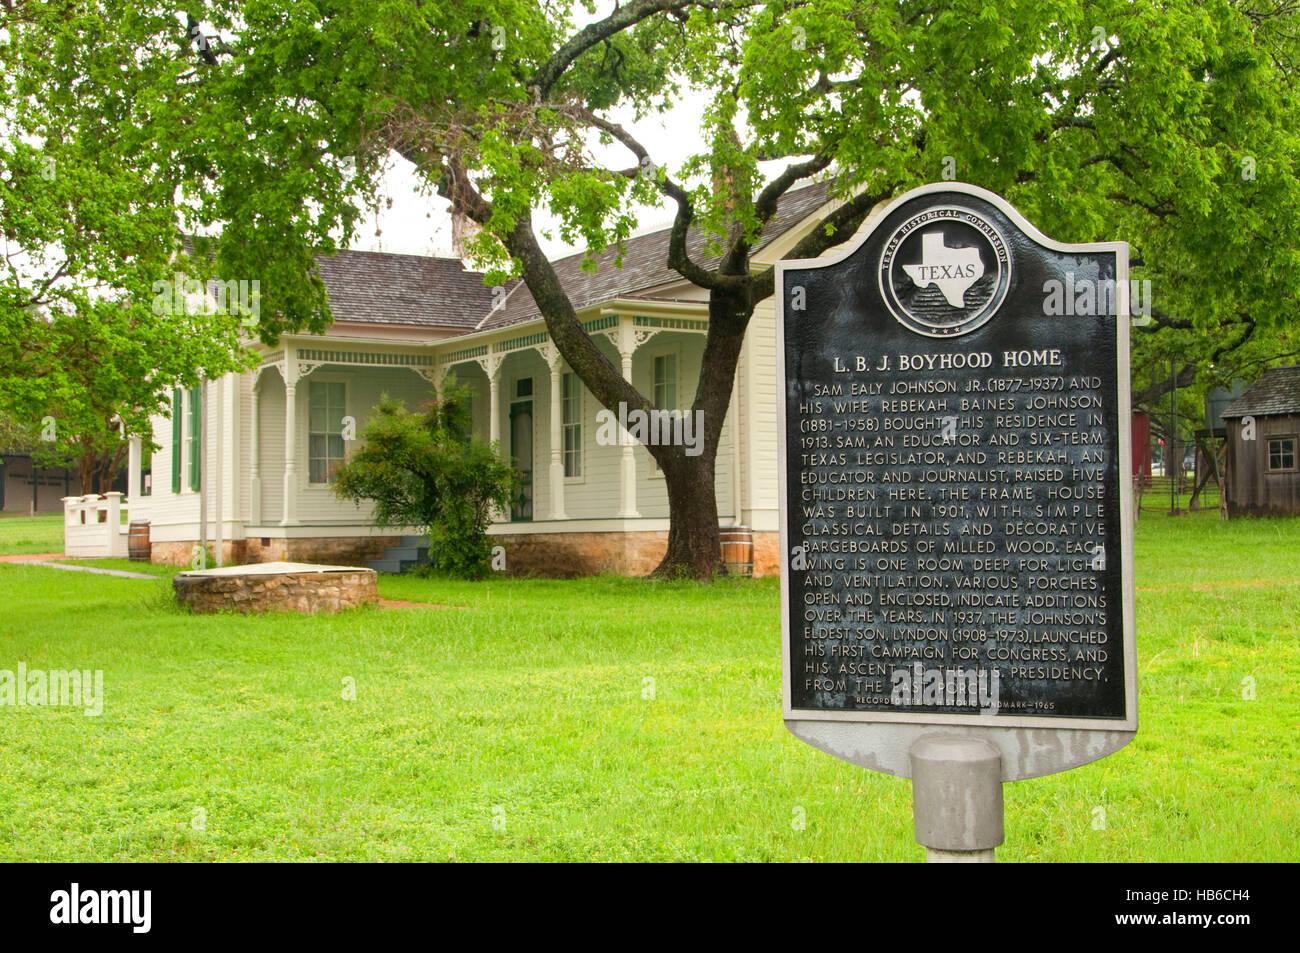 Lbj boyhood home with historic sign lyndon b johnson national lbj boyhood home with historic sign lyndon b johnson national historical park texas publicscrutiny Image collections